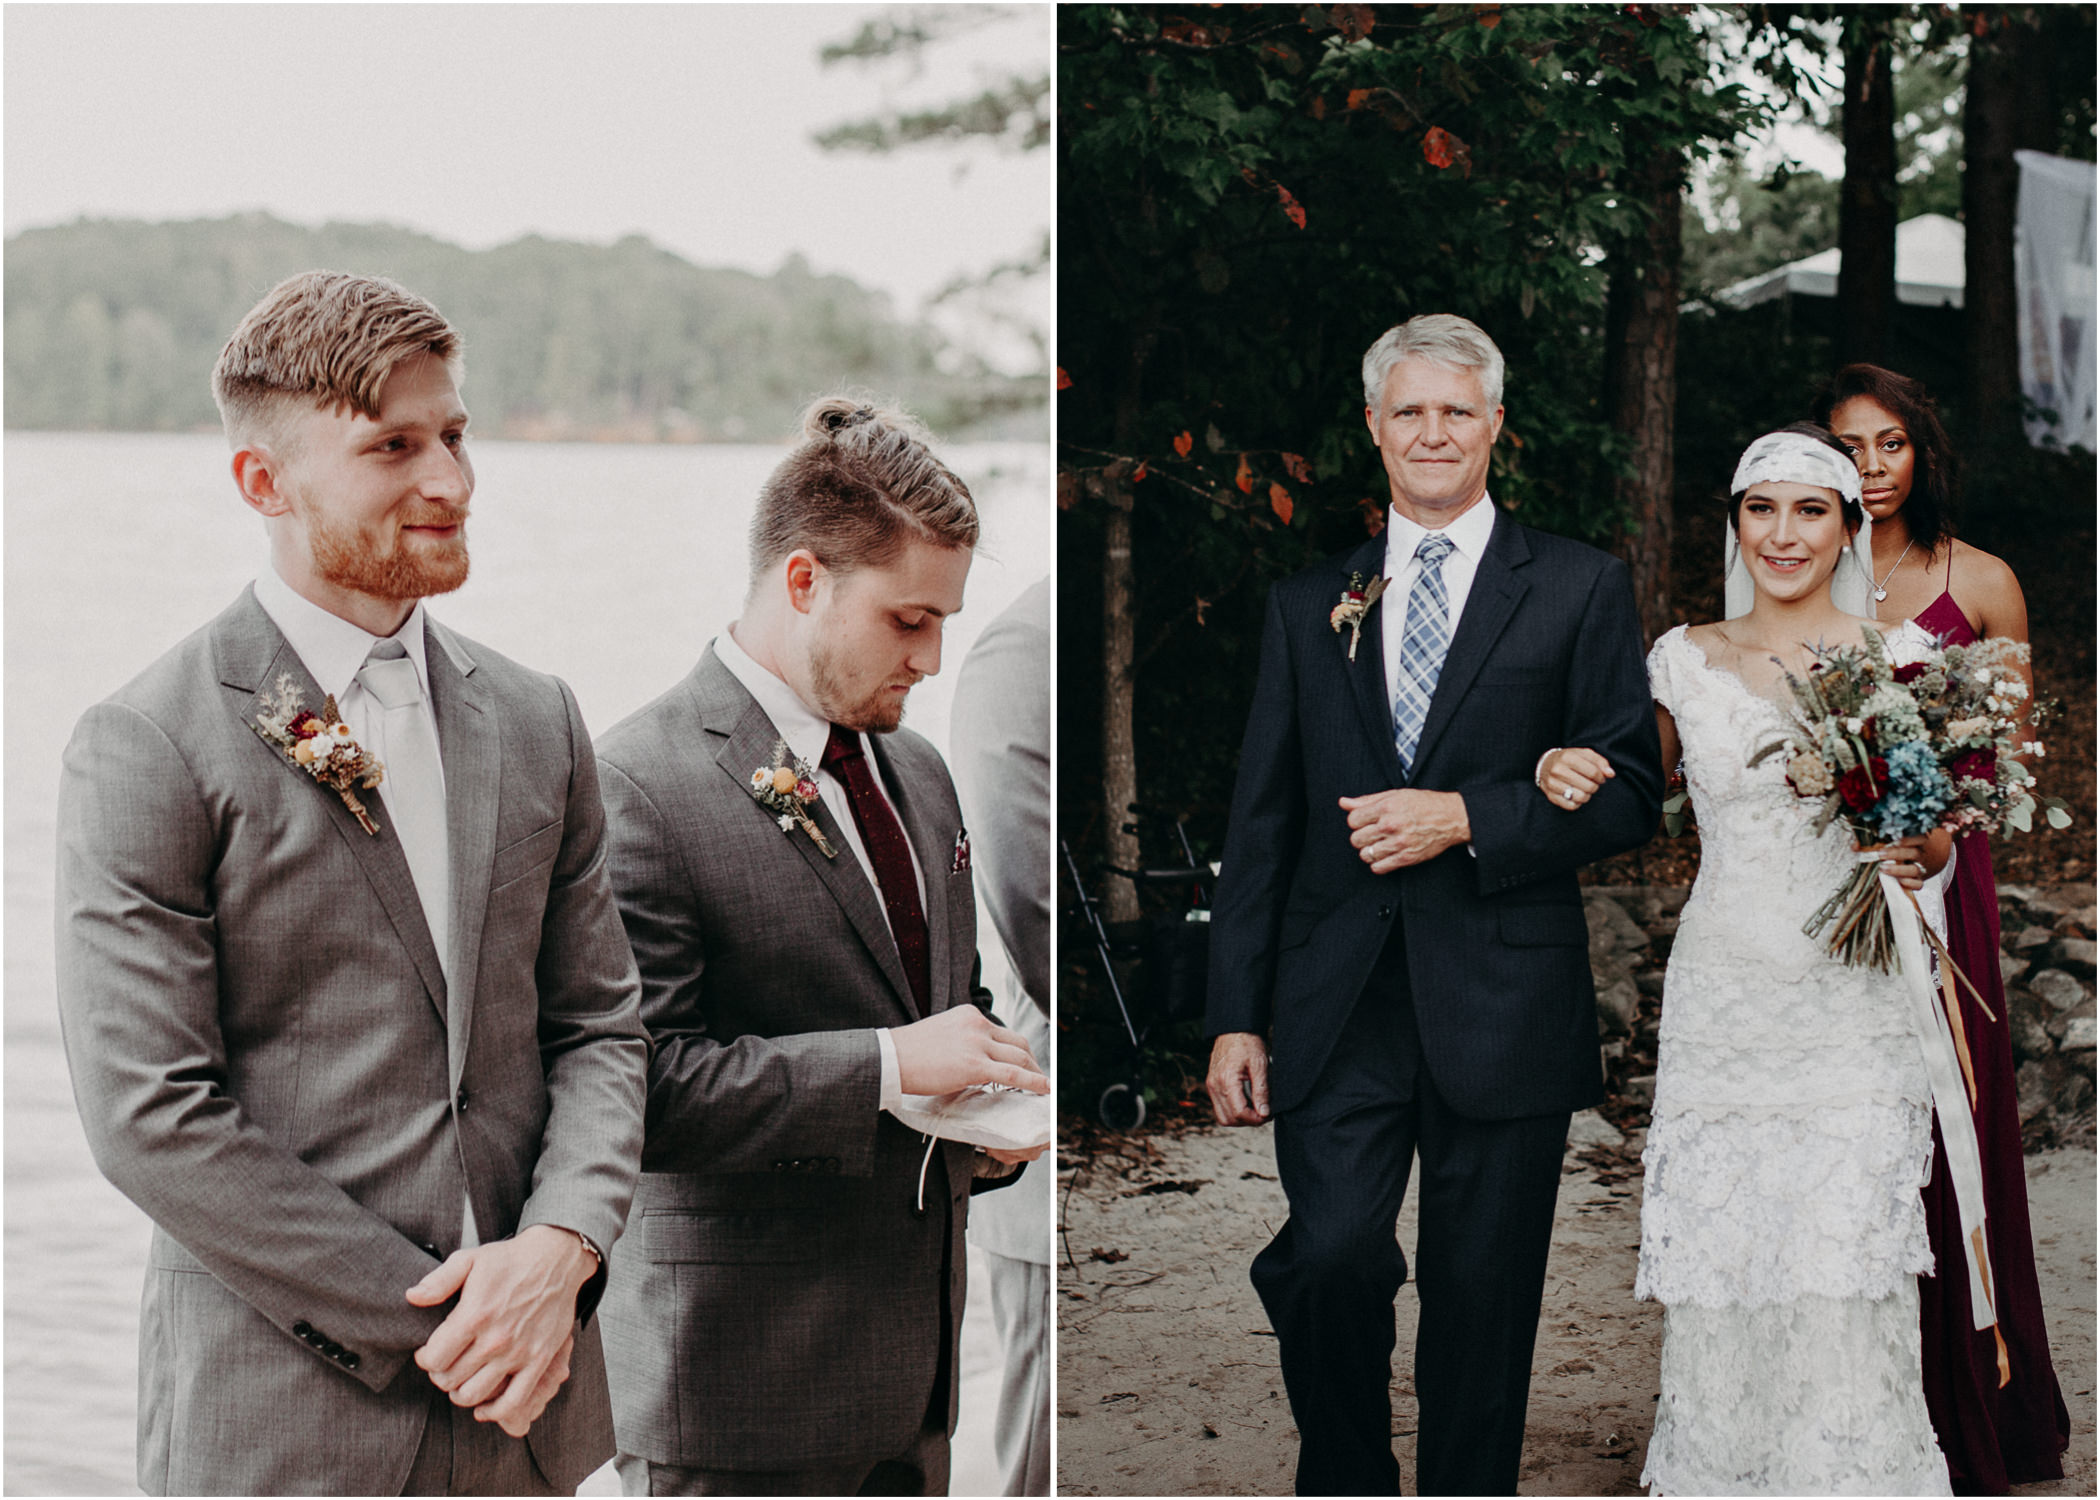 95 - Bride walking down the aisle -  Wedding Ceremony - Destination Wedding : Beach : Lake Wedding Atlanta Wedding Photographer .jpg